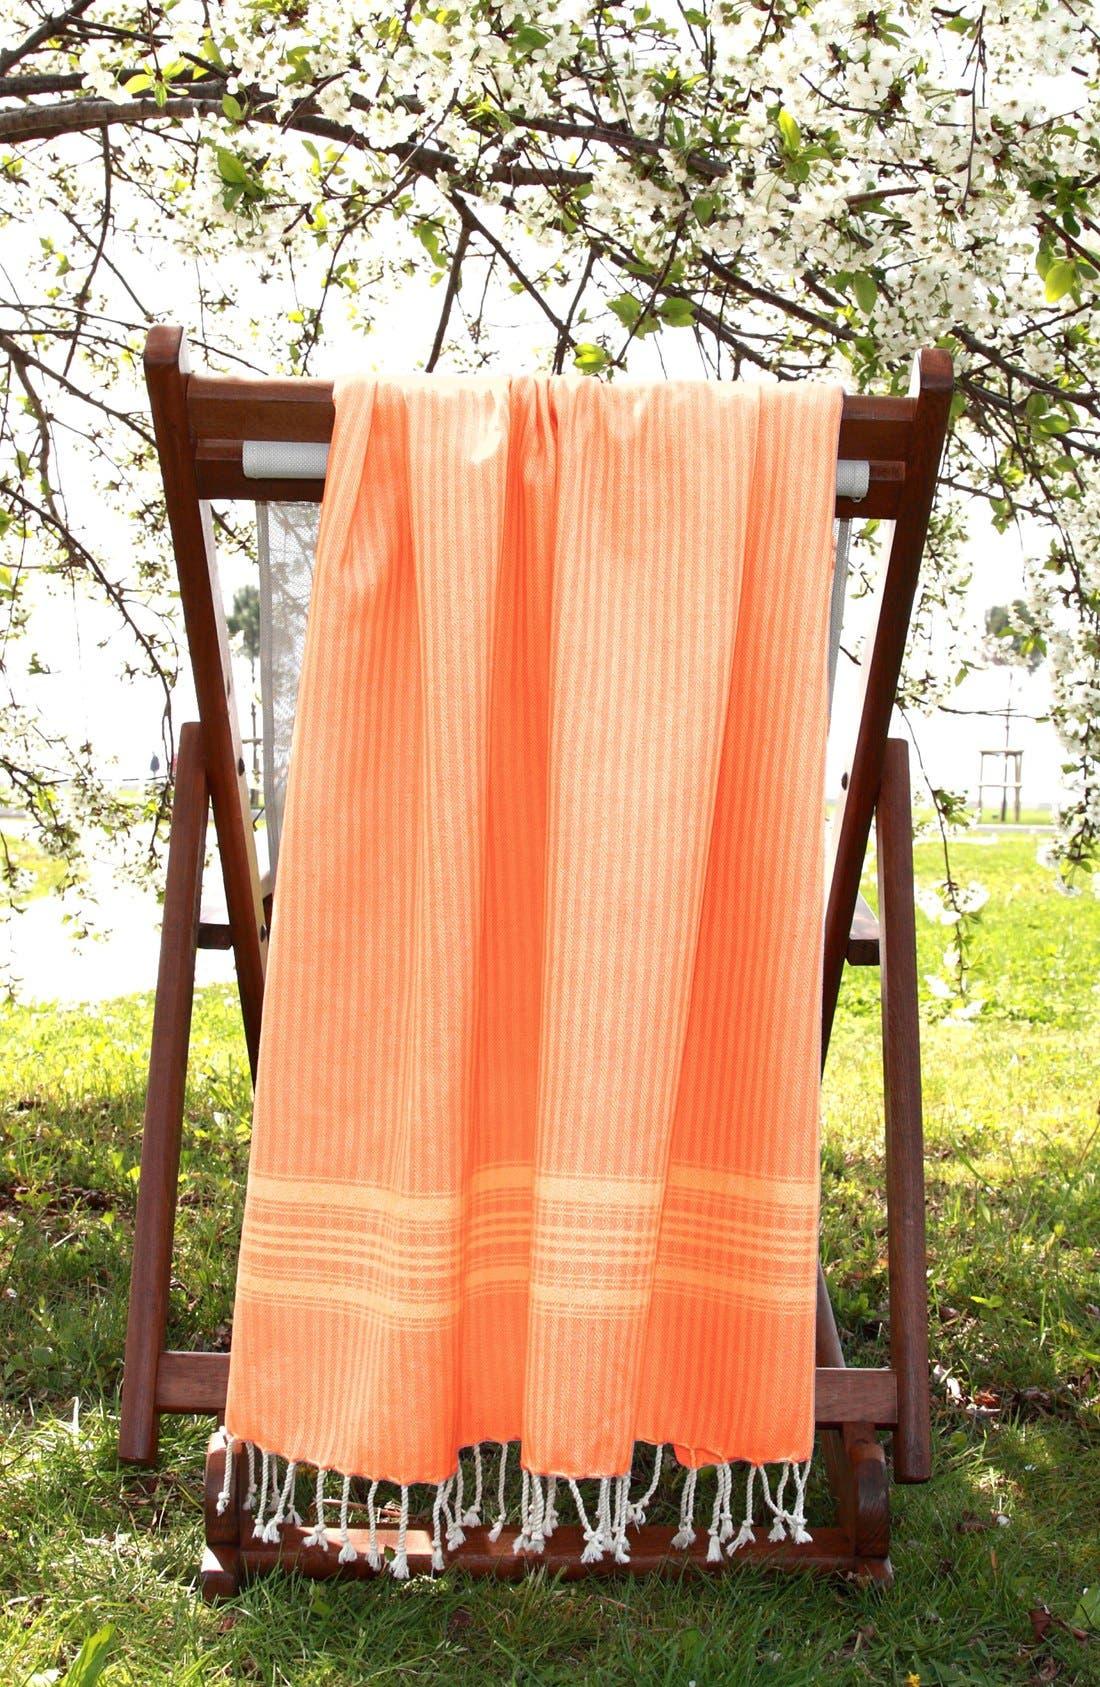 Alternate Image 1 Selected - Linum Home Textiles 'Luxe Herringbone' Turkish Pestemal Towel